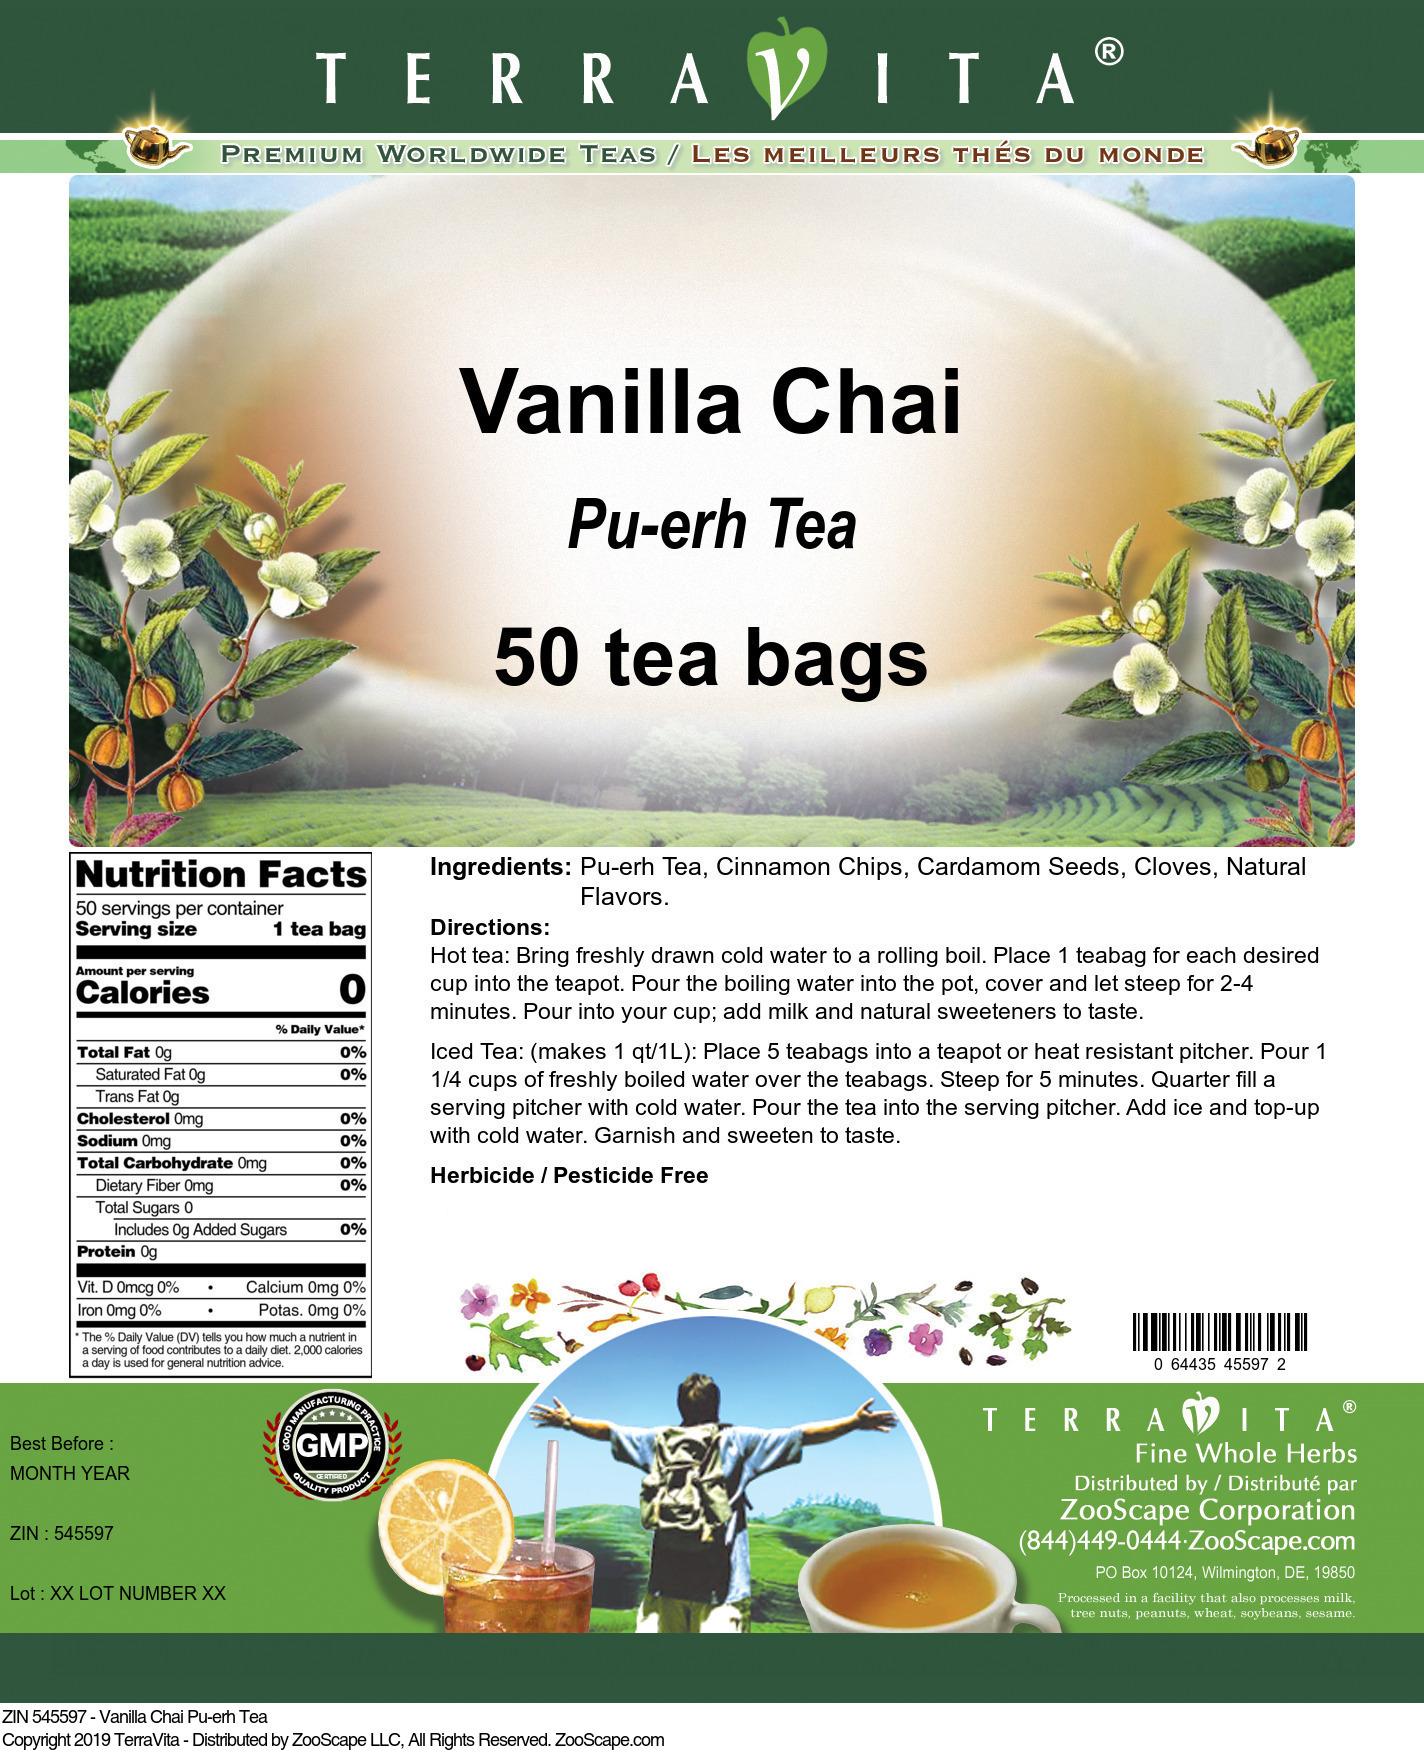 Vanilla Chai Pu-erh Tea